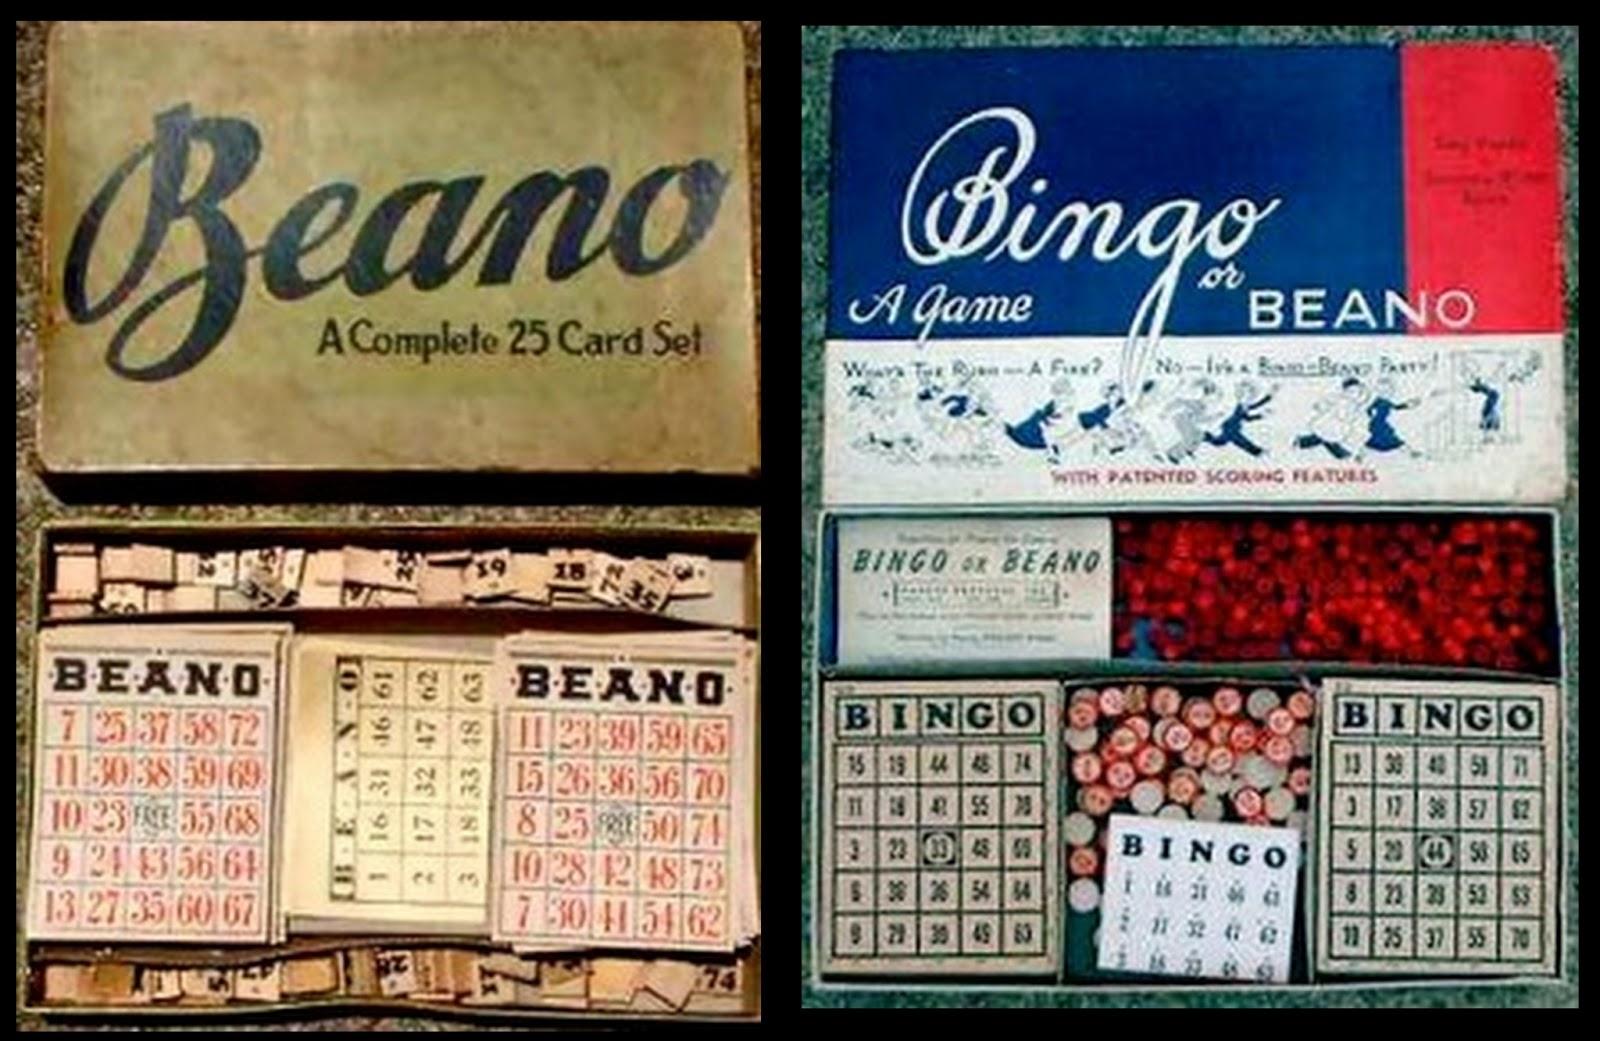 bingo-or-beano-237x300